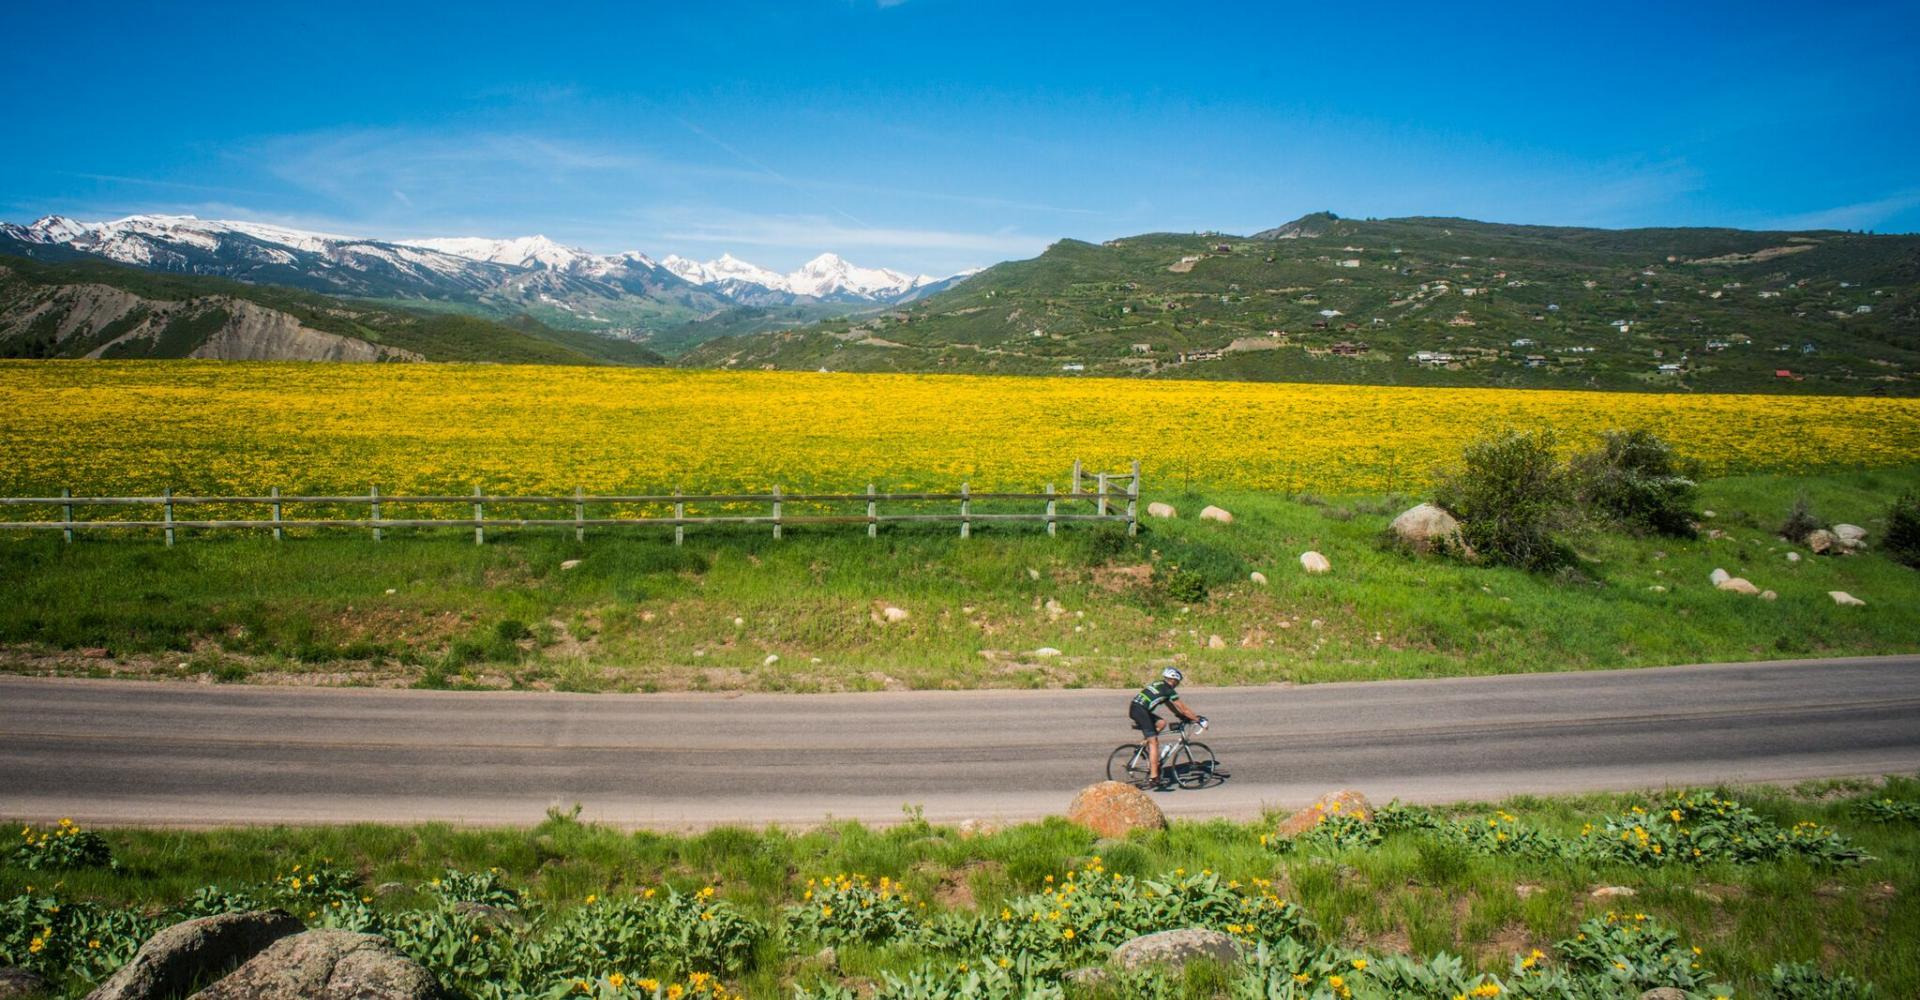 Summer Mountain Races, Sporting Events & Adventure Programs in Aspen ...